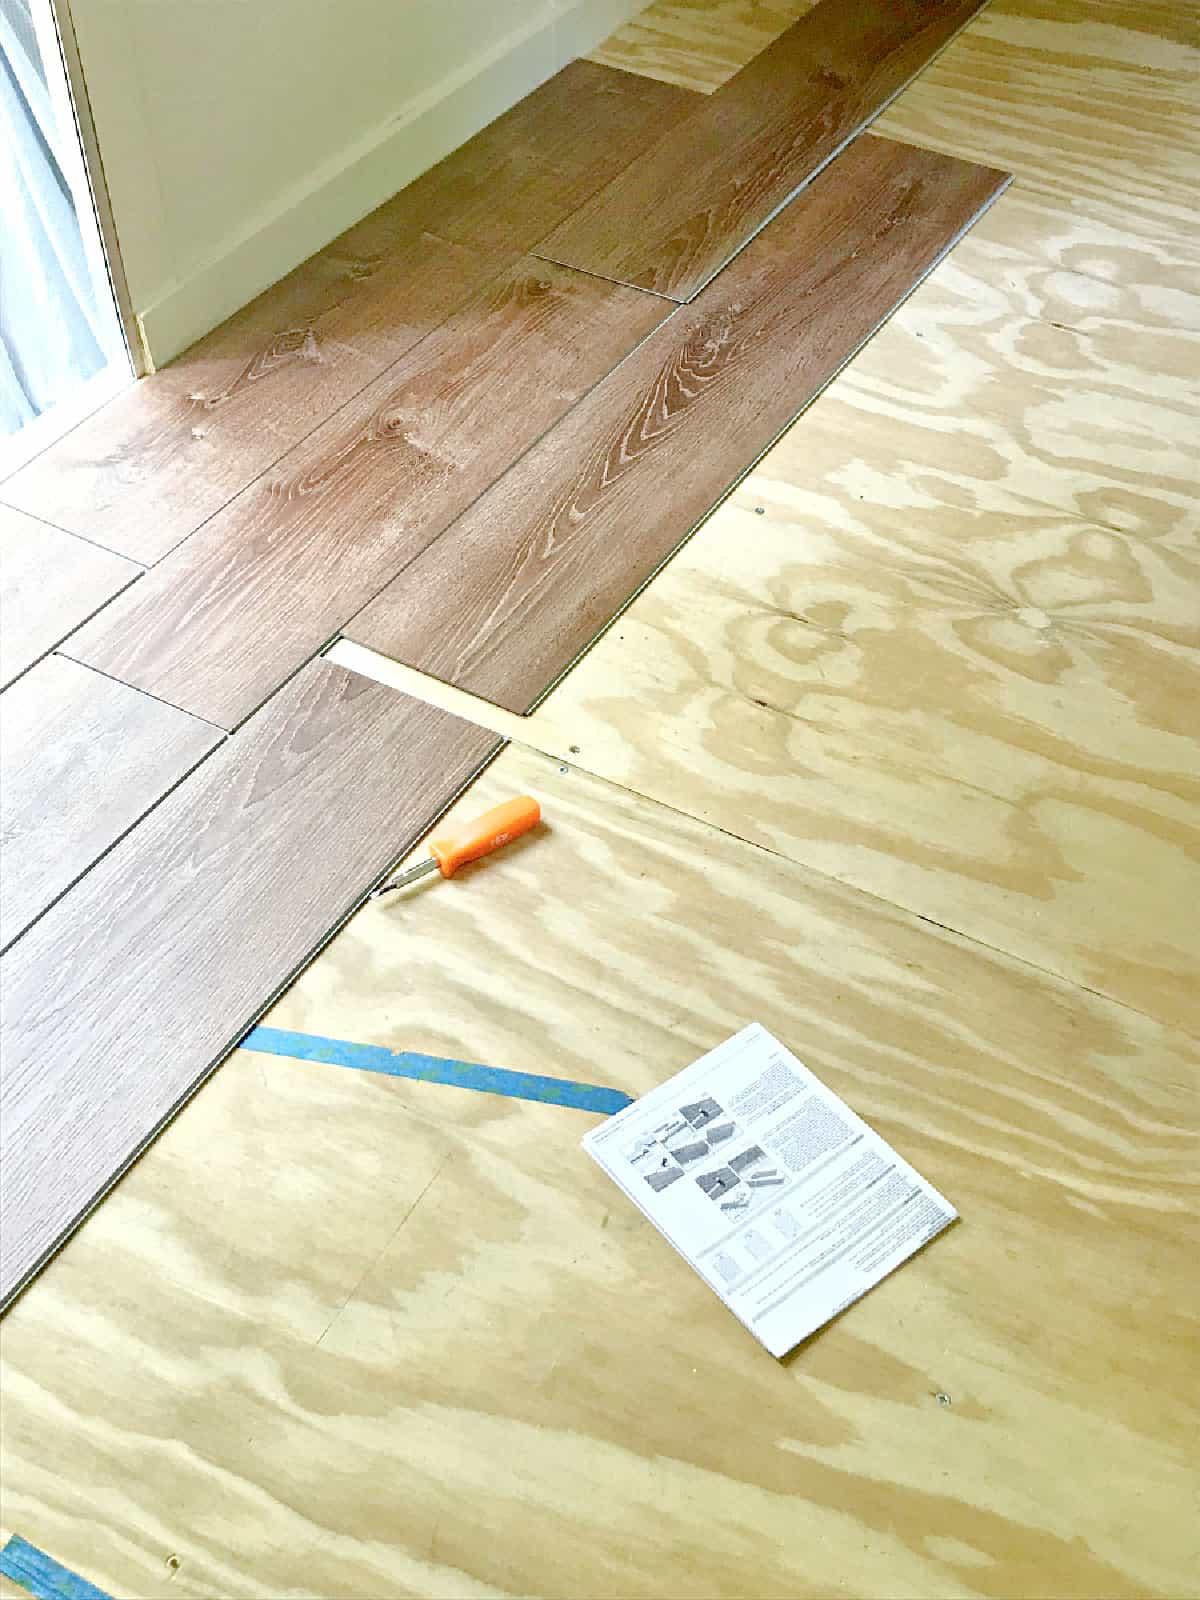 vinyl planks being installed in an RV